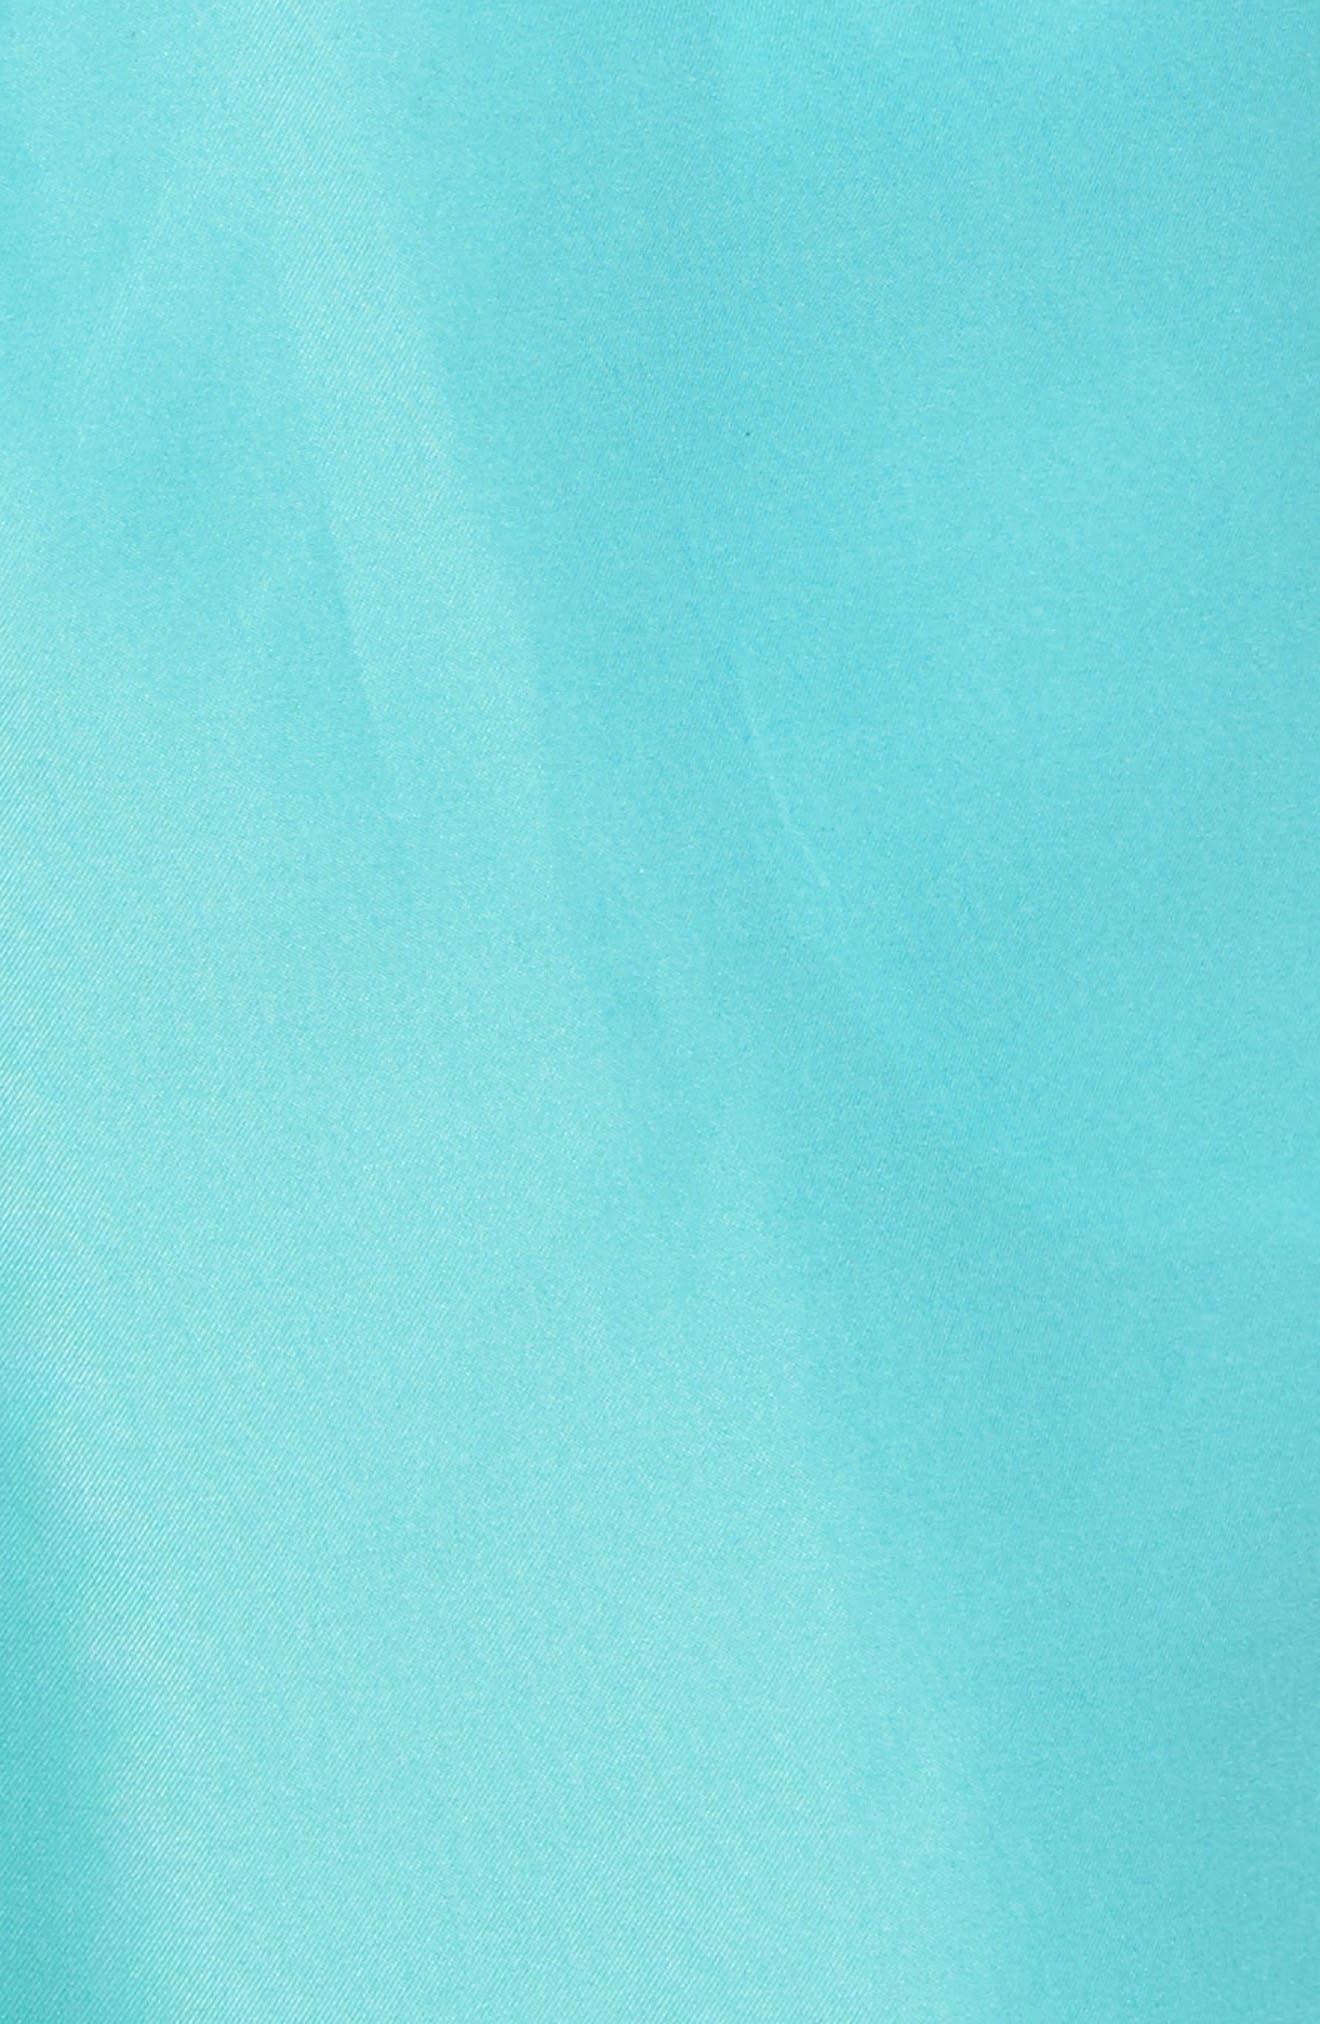 San O Swim Trunks,                             Alternate thumbnail 5, color,                             306